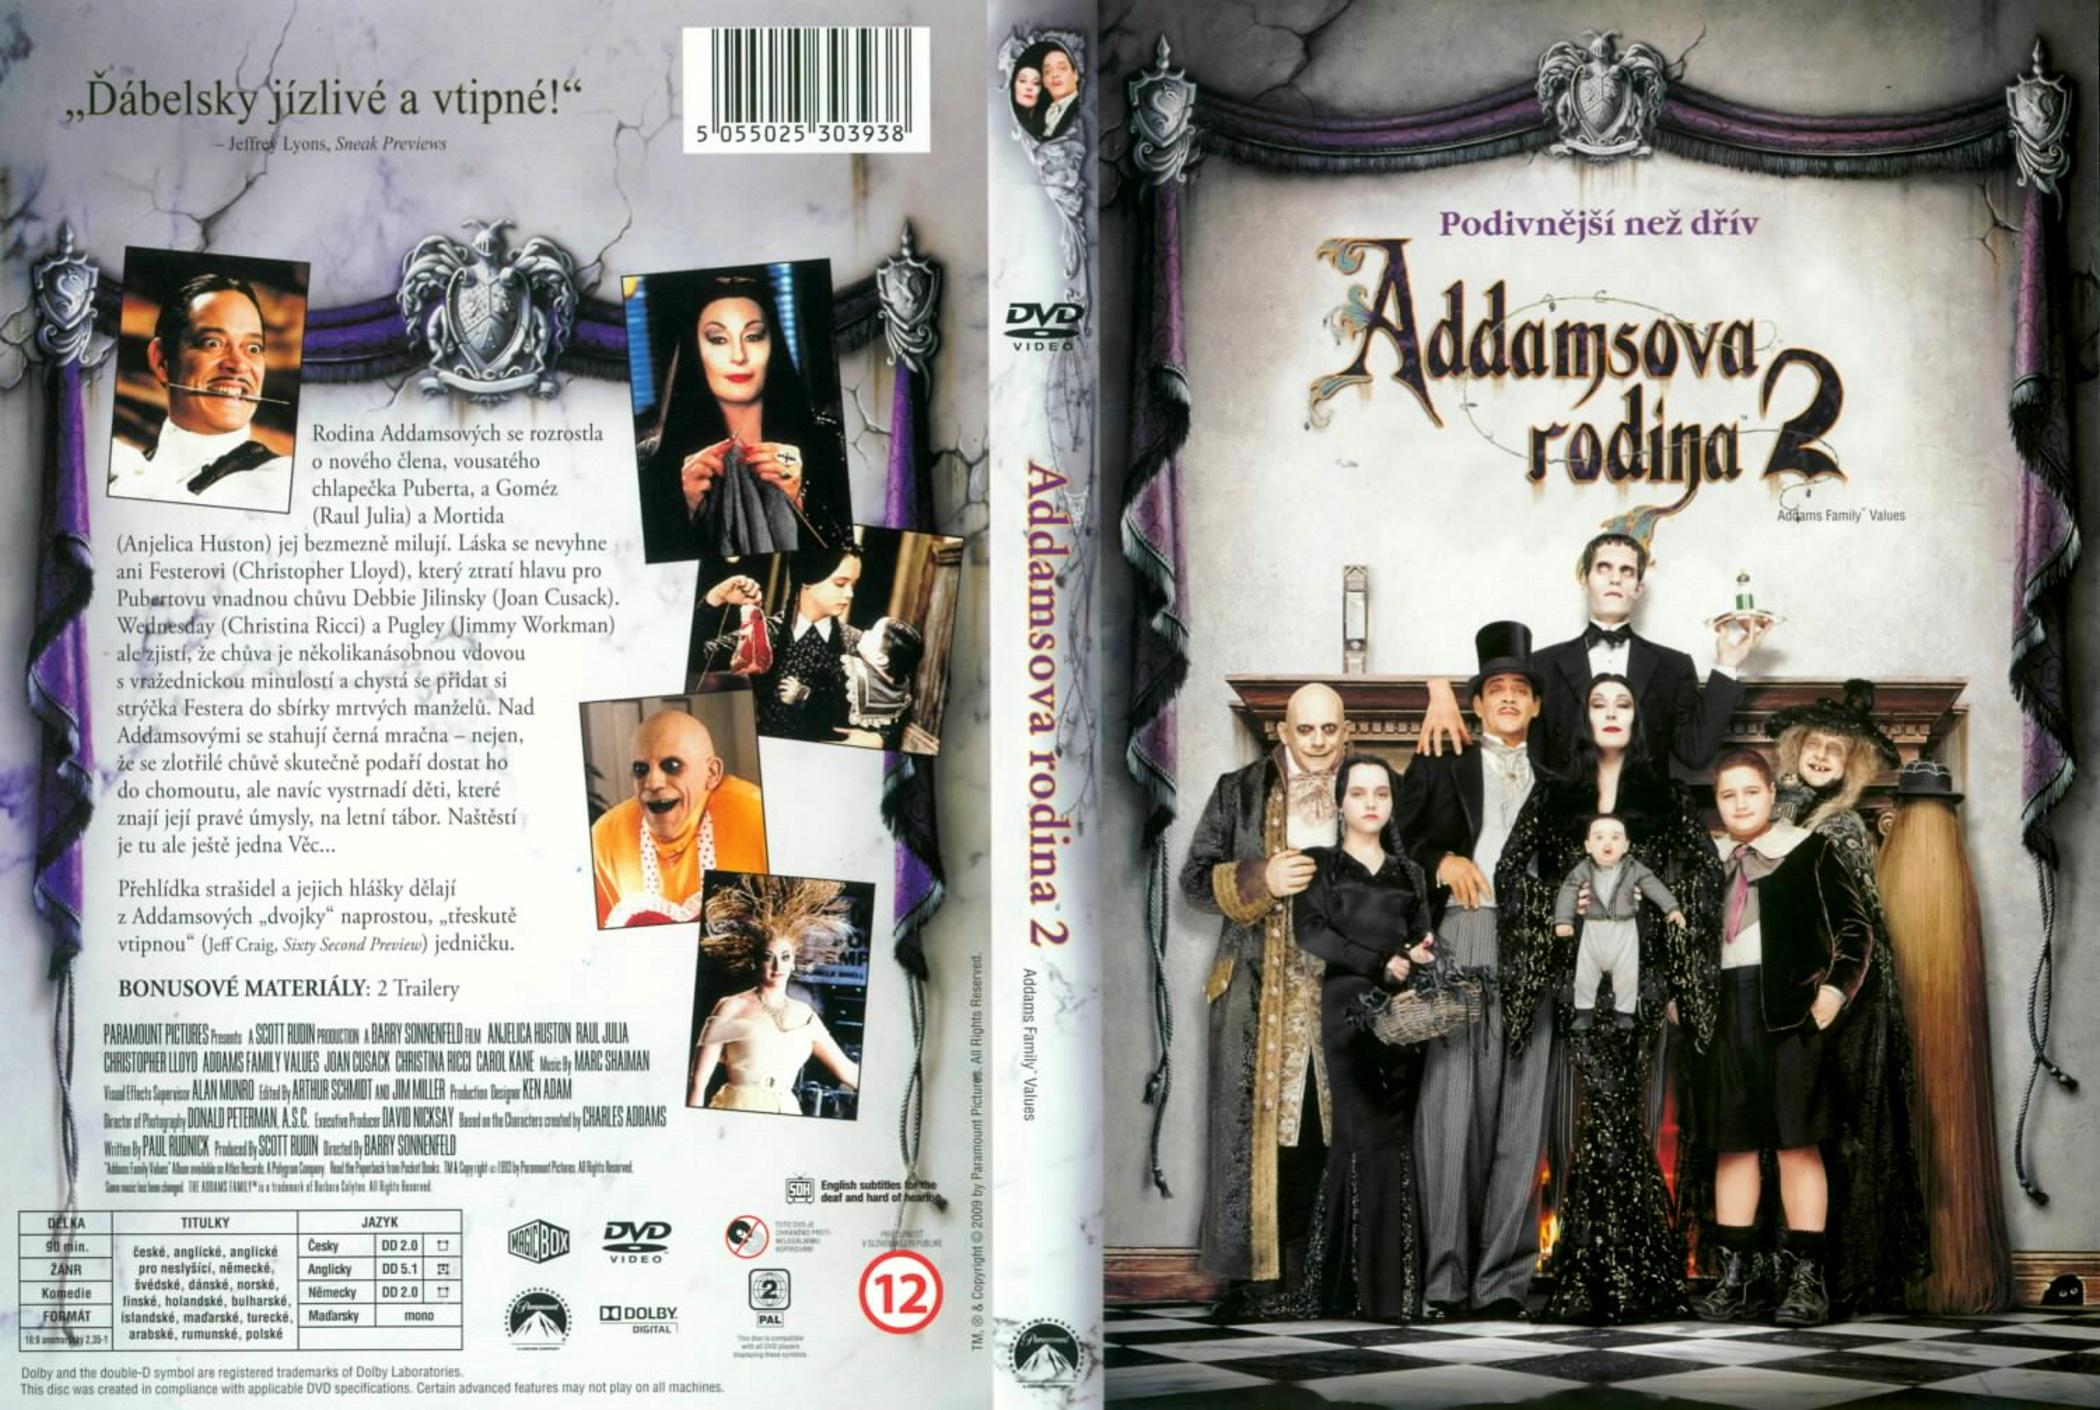 Family Values Cover Addams Family Values 1993